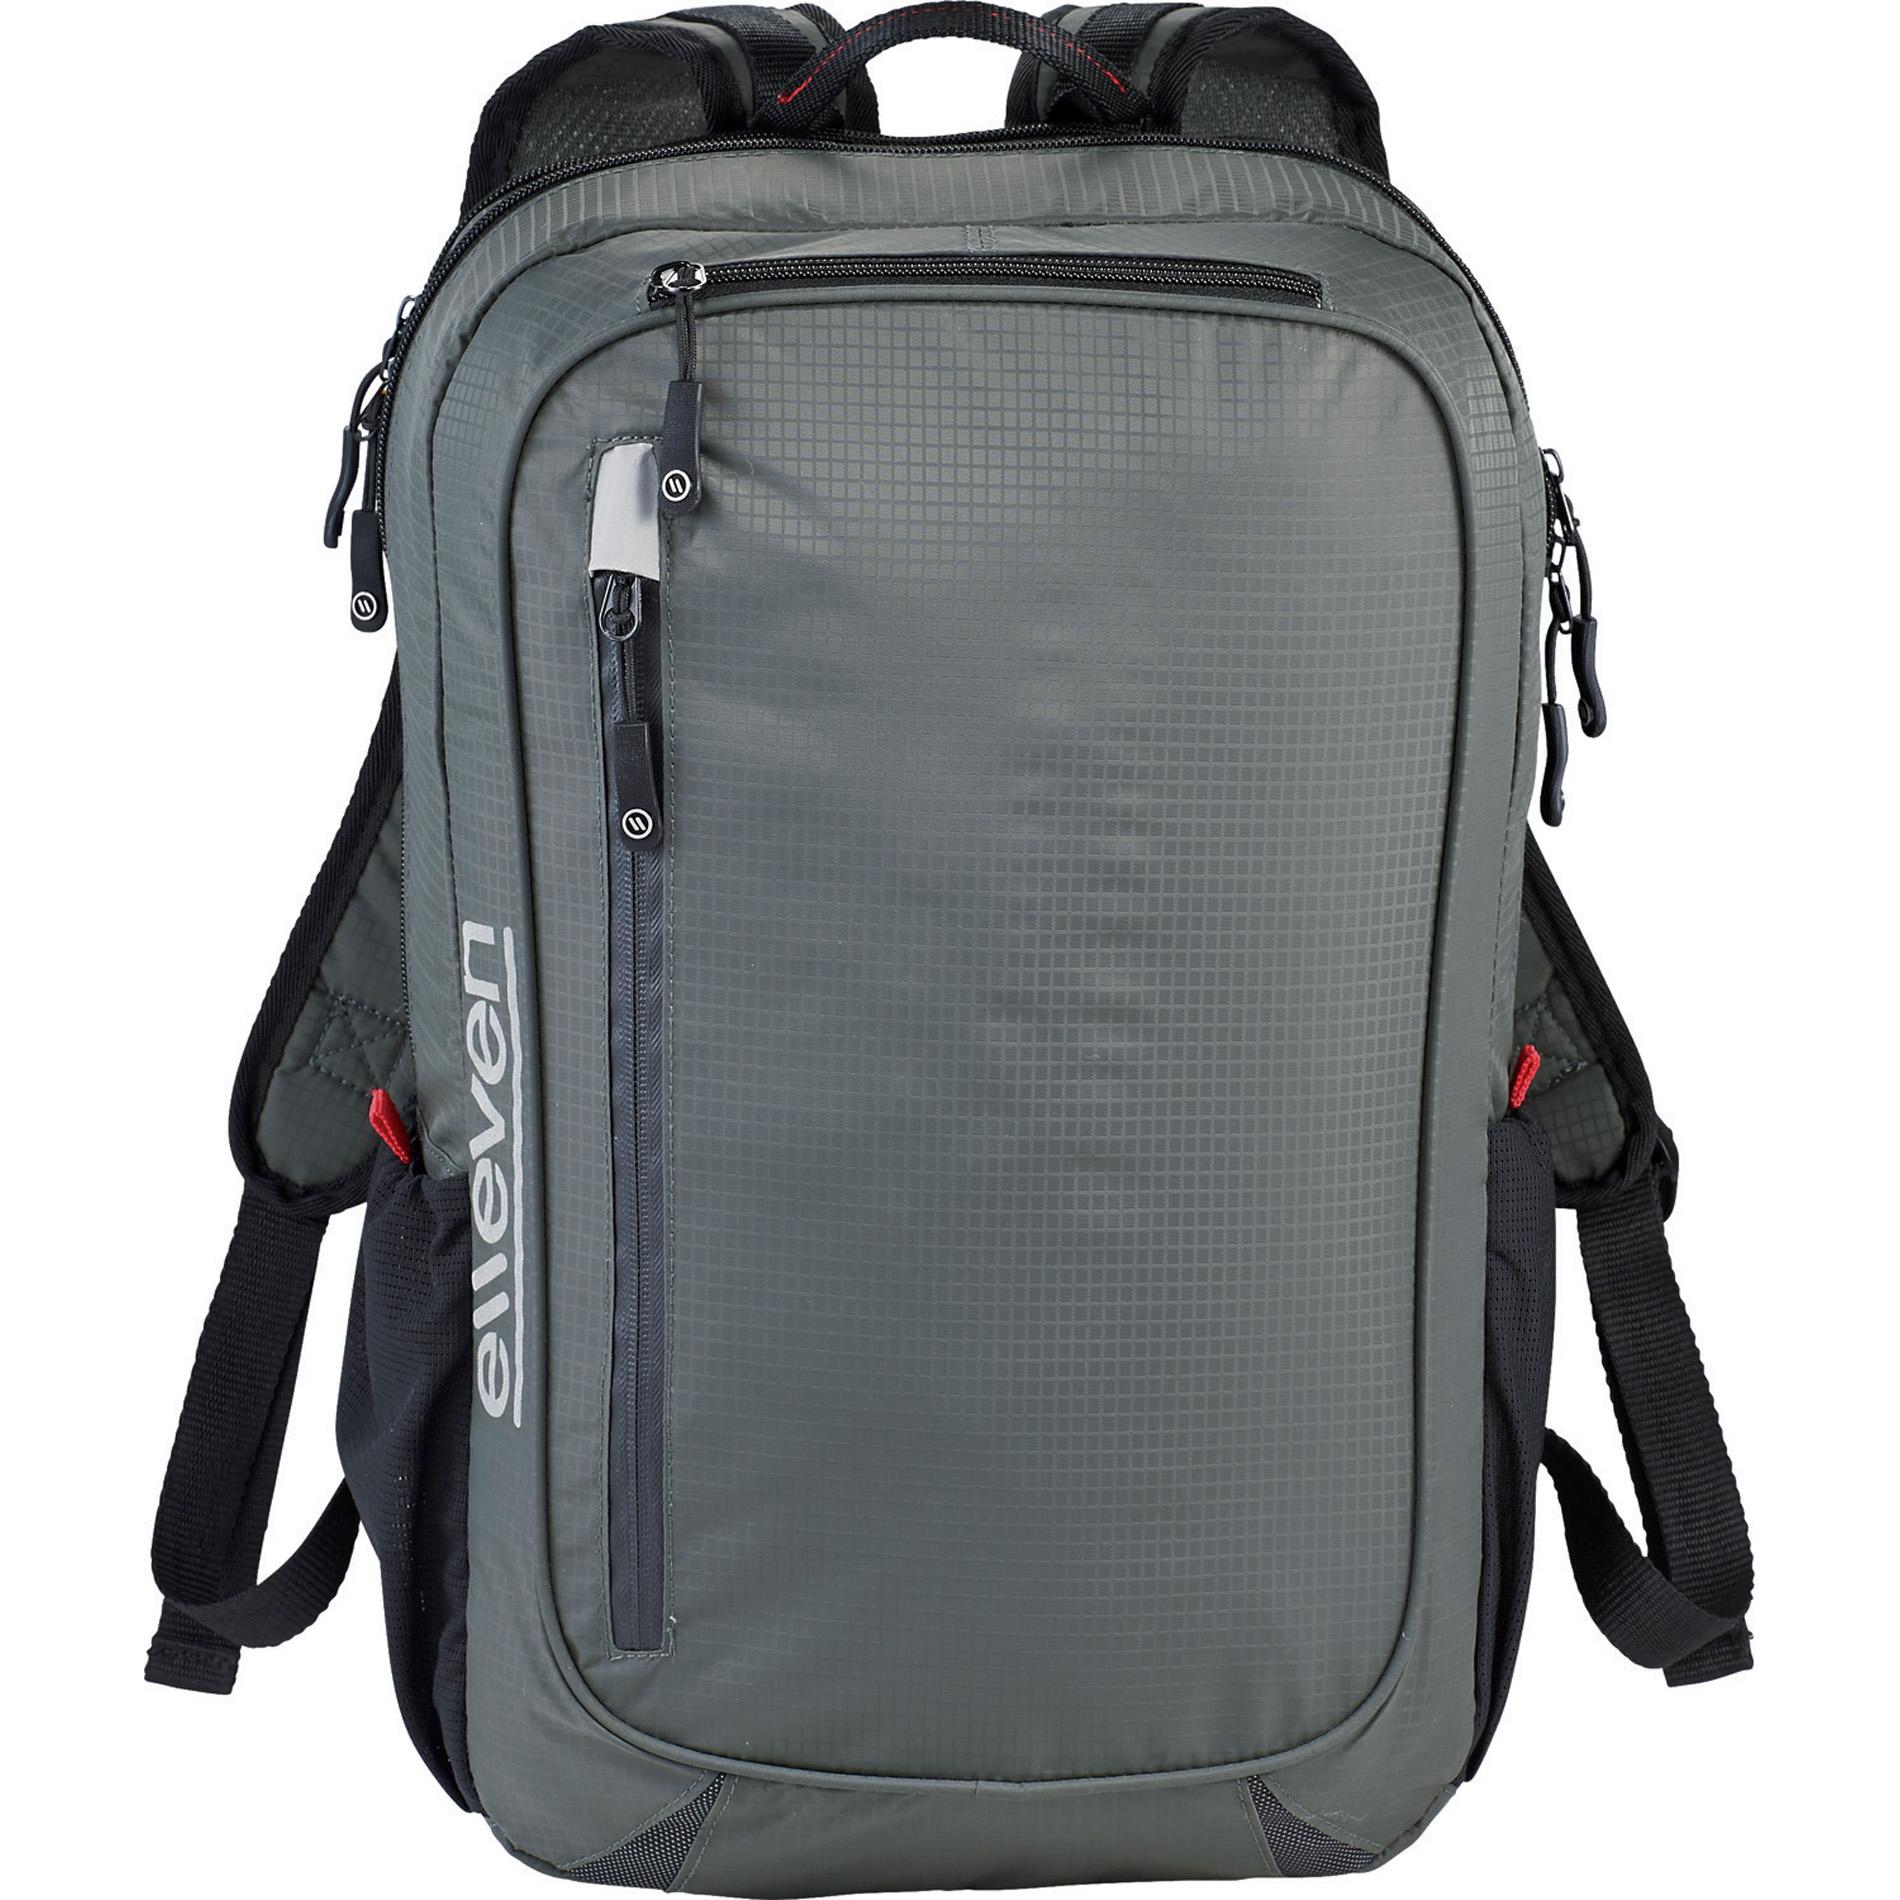 "elleven 0011-34 - Lunar Lightweight 15"" Computer Backpack"